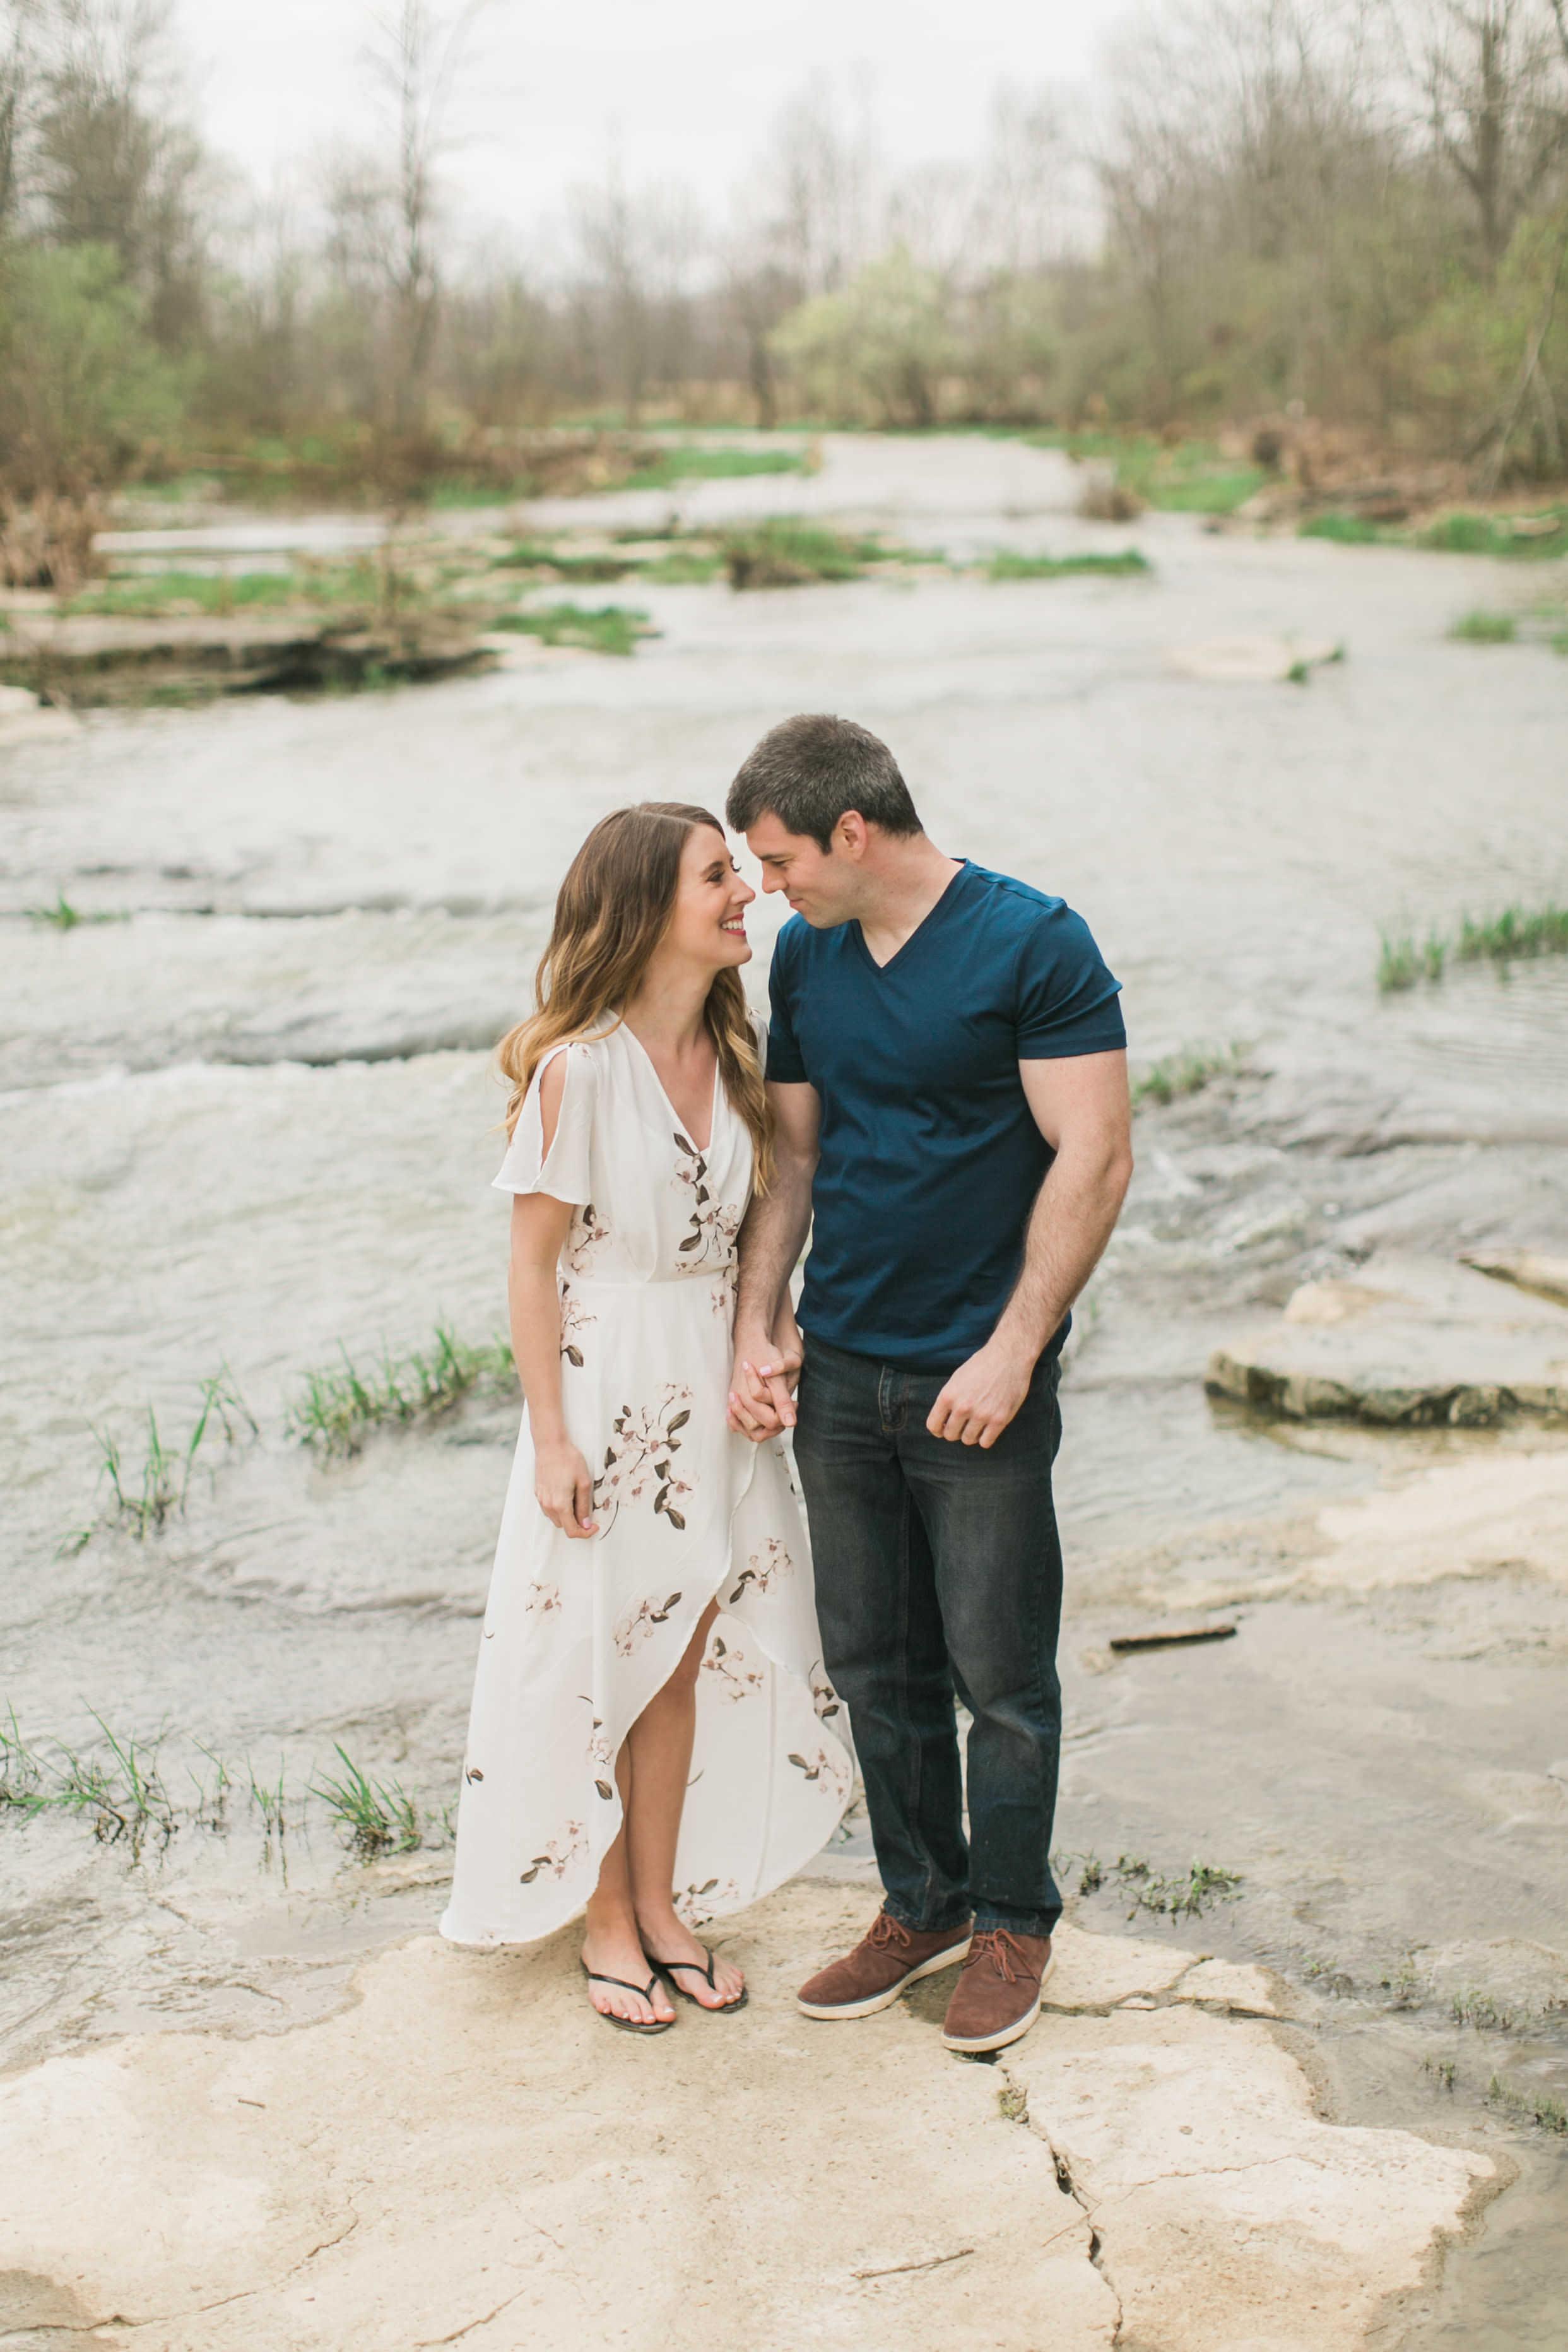 Holly___Ian___Engagement_Session___Daniel_Ricci_Wedding_Photography_26.jpg